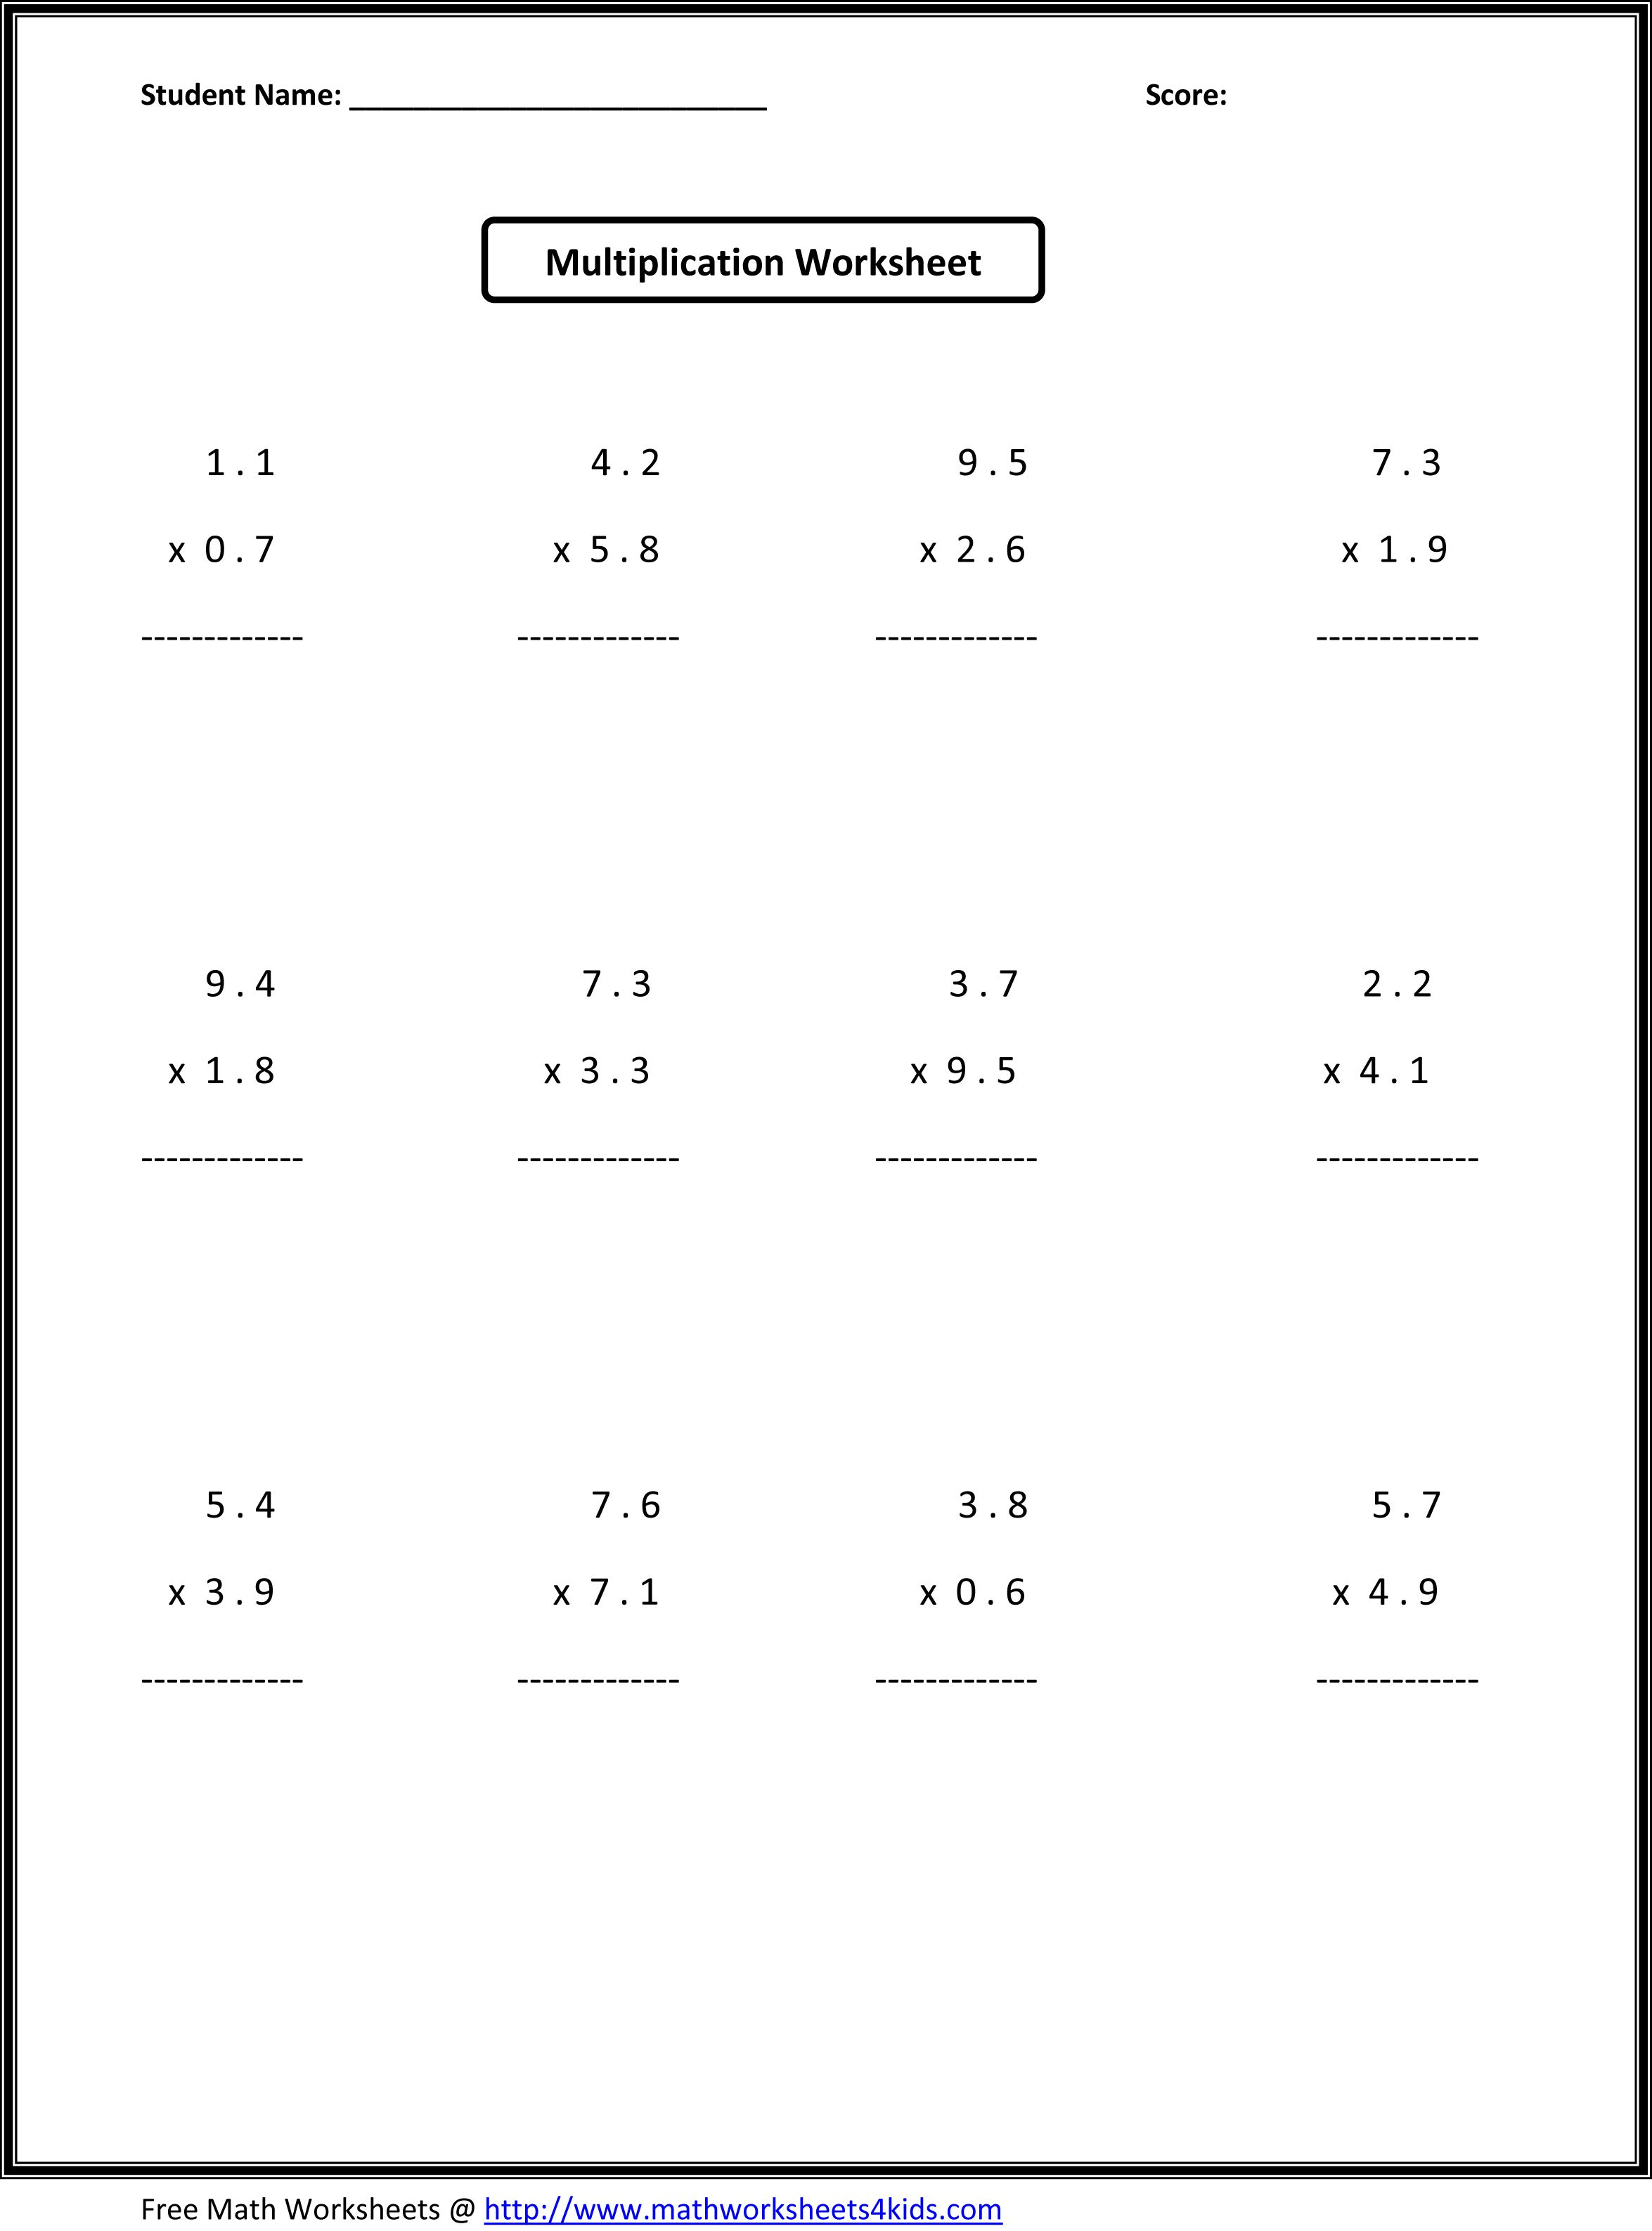 7Th Grade Math Worksheets | Value Worksheets Absolute Value - Free | Free Printable Math Worksheets 6Th Grade Order Operations